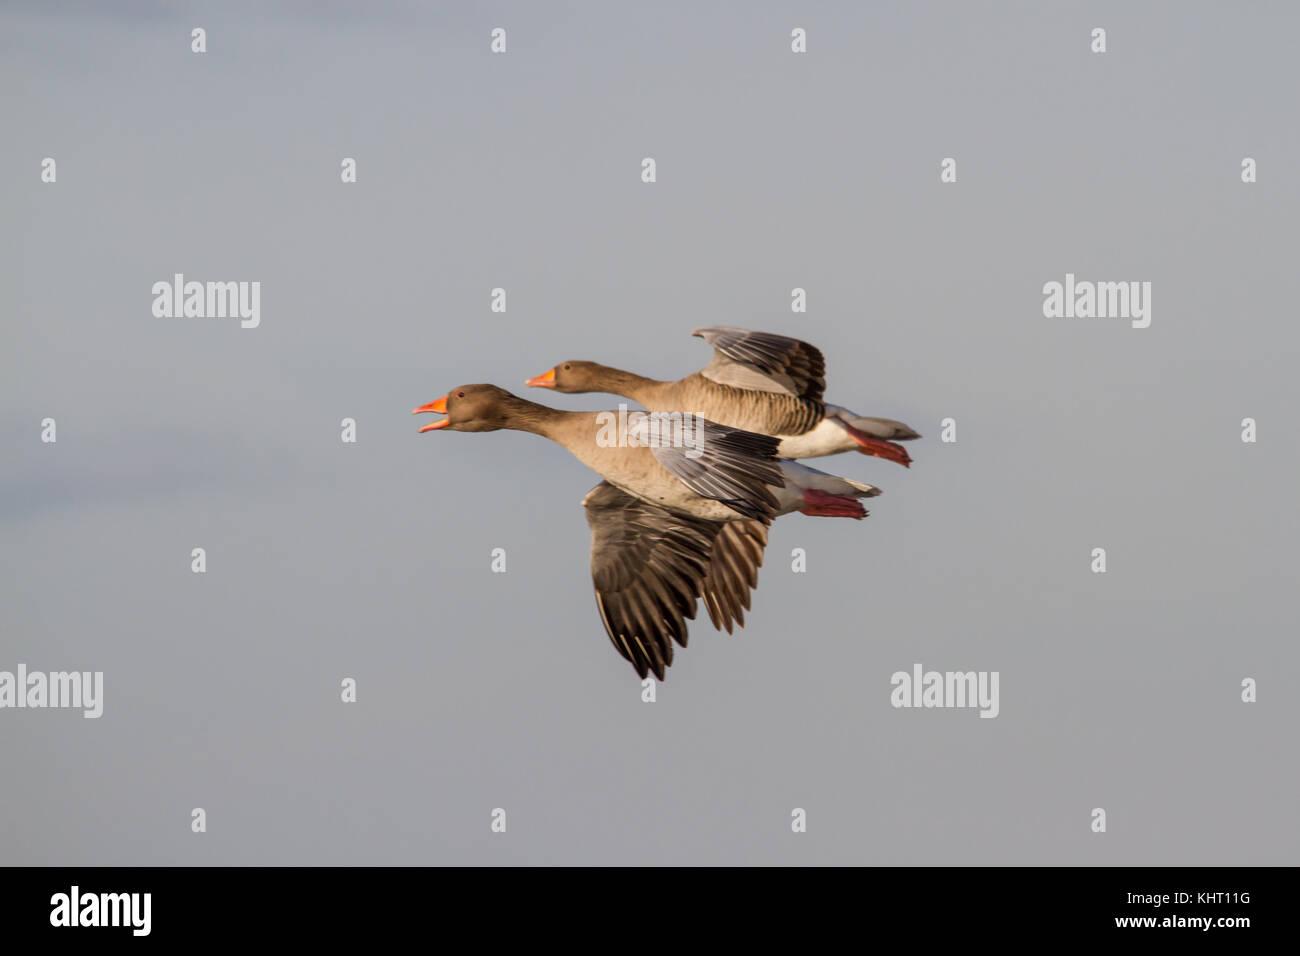 A flock of Greylag Geese (Anser anser) in flight - Stock Image